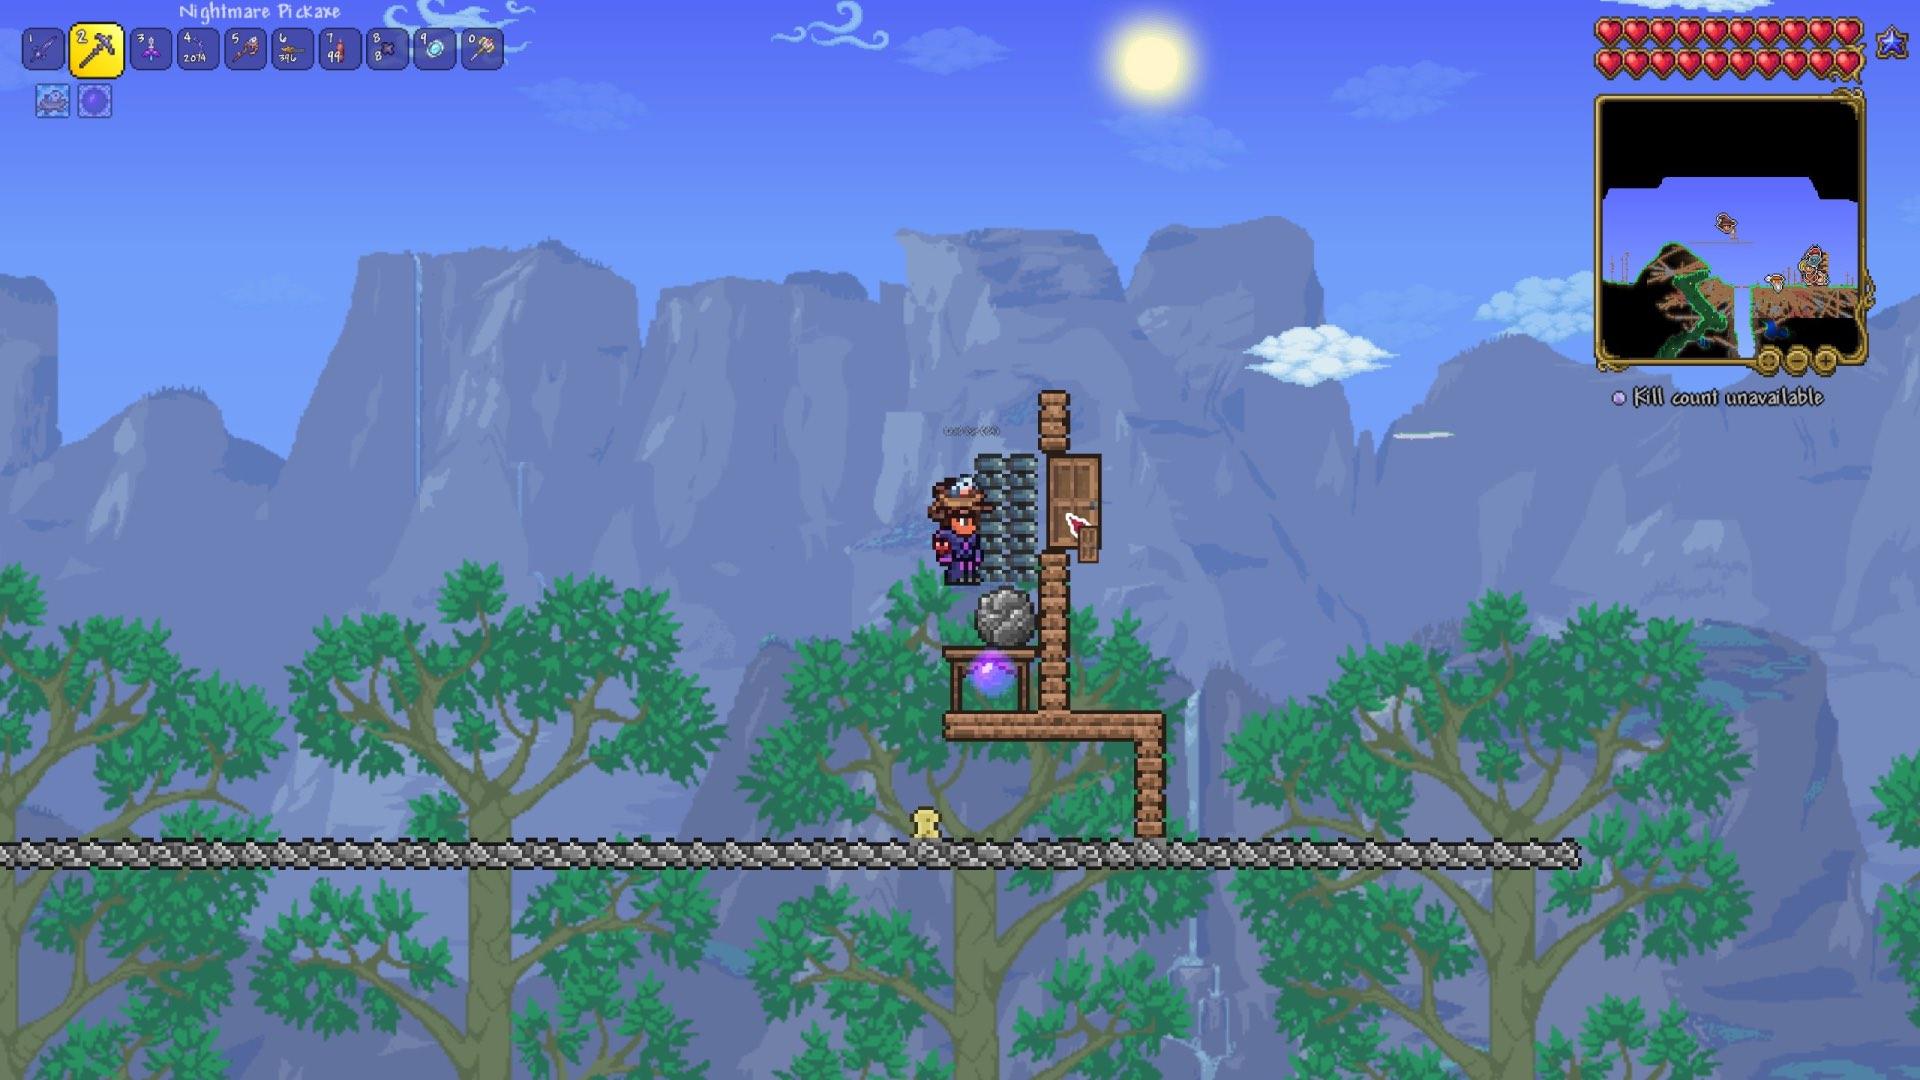 How to duplicate in Terraria Screenshot 2